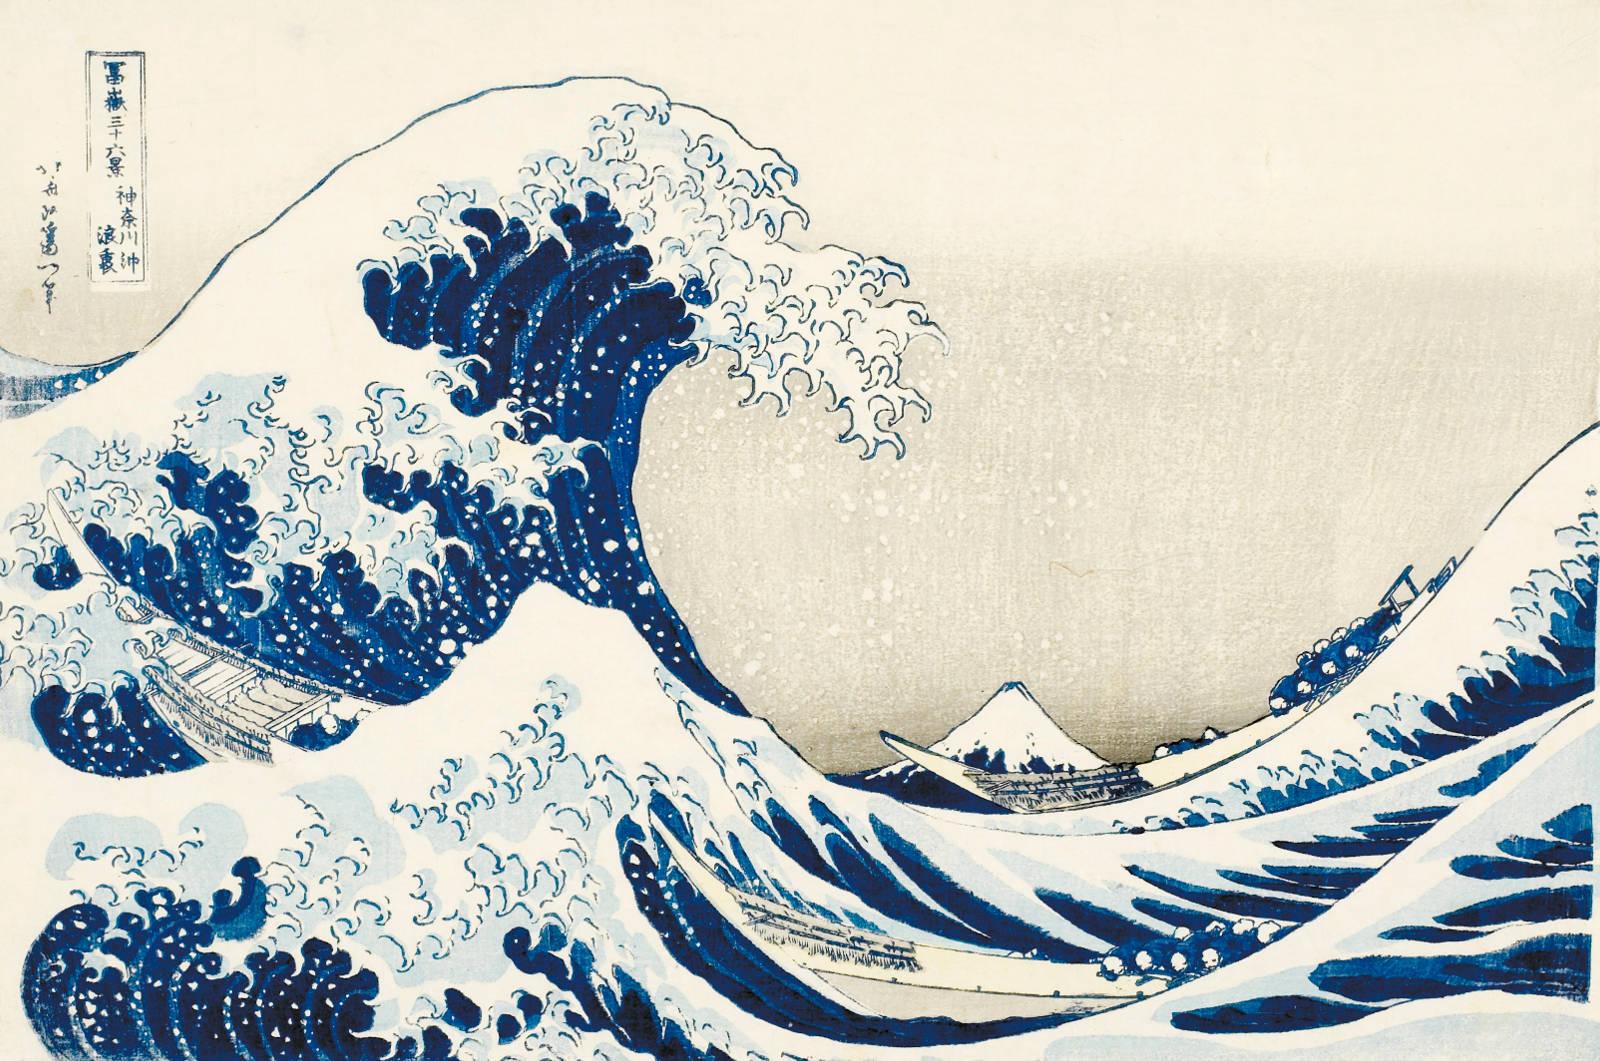 Hokusai, Hiroshige e Utamaro in mostra a Palazzo Reale a Milano